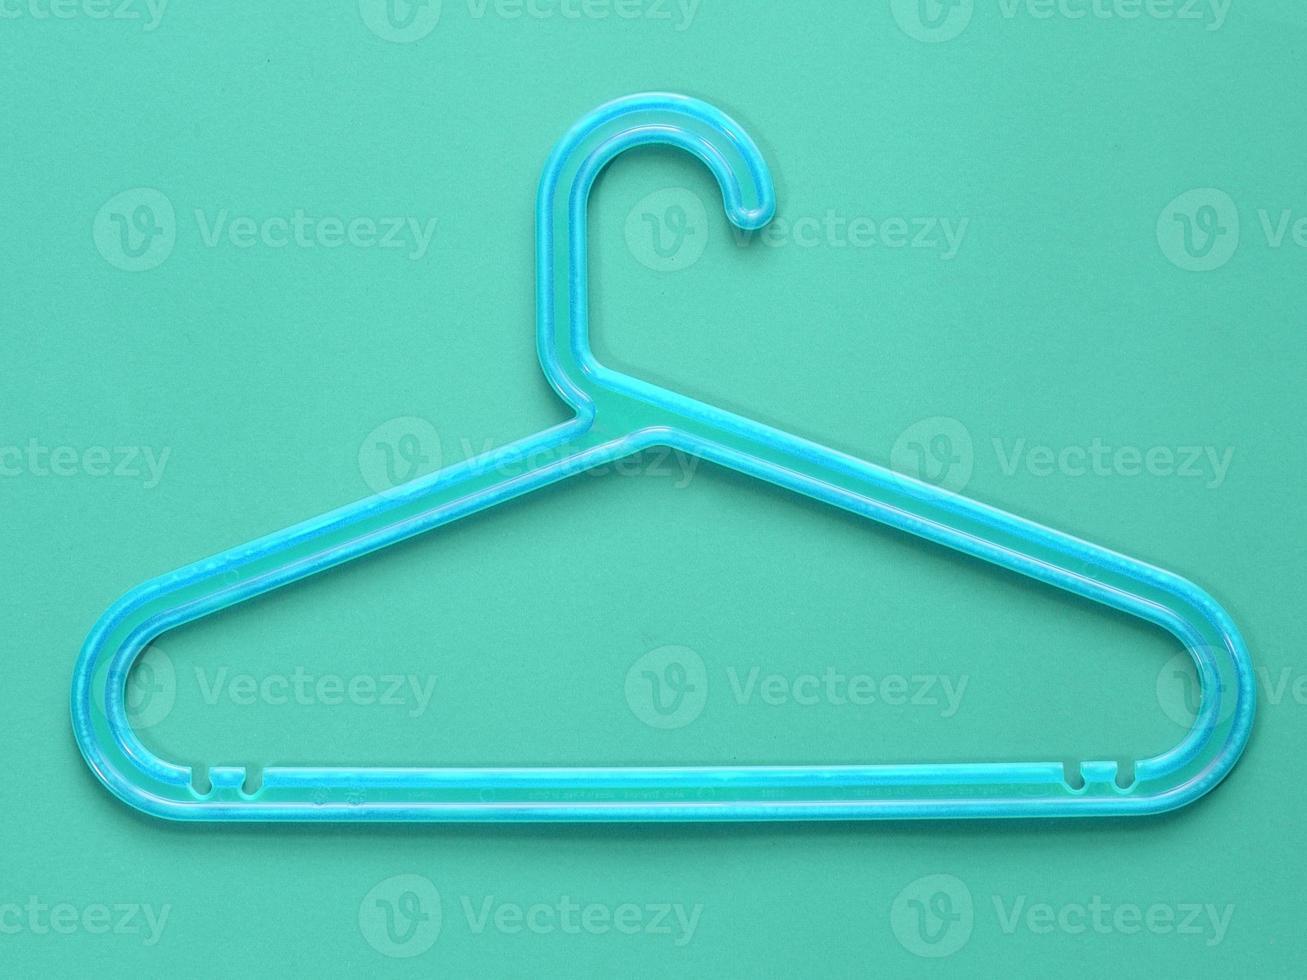 cabide de pano plástico azul sobre fundo azul foto